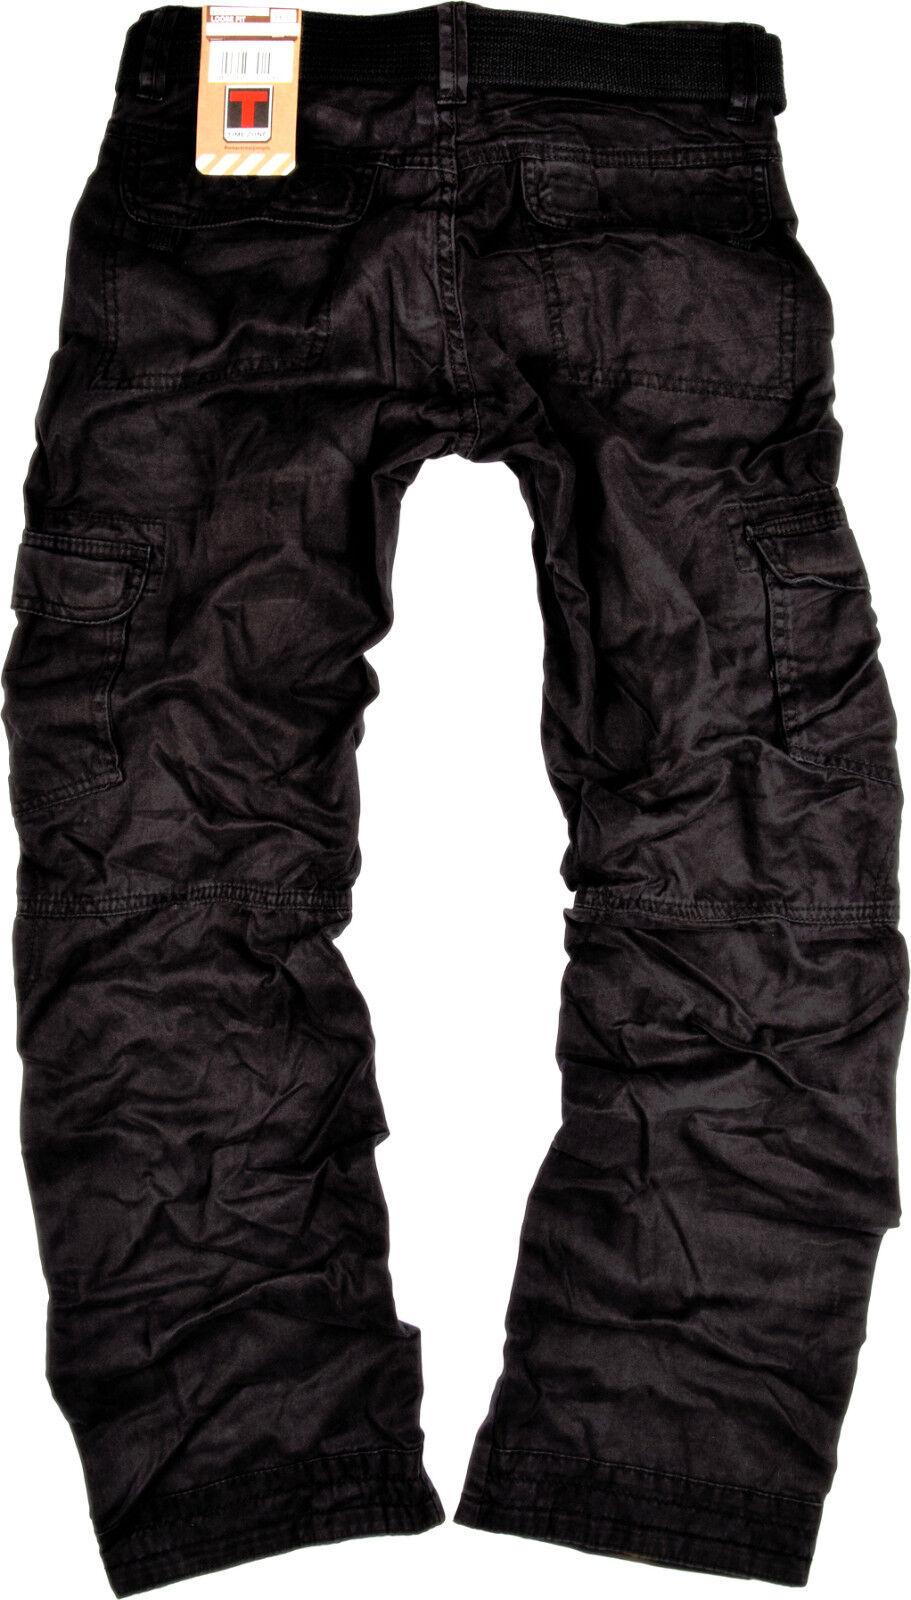 timezone herren cargo hose benito schwarz cargohose outdoor 999 herrenhose jeans eur 48 99. Black Bedroom Furniture Sets. Home Design Ideas